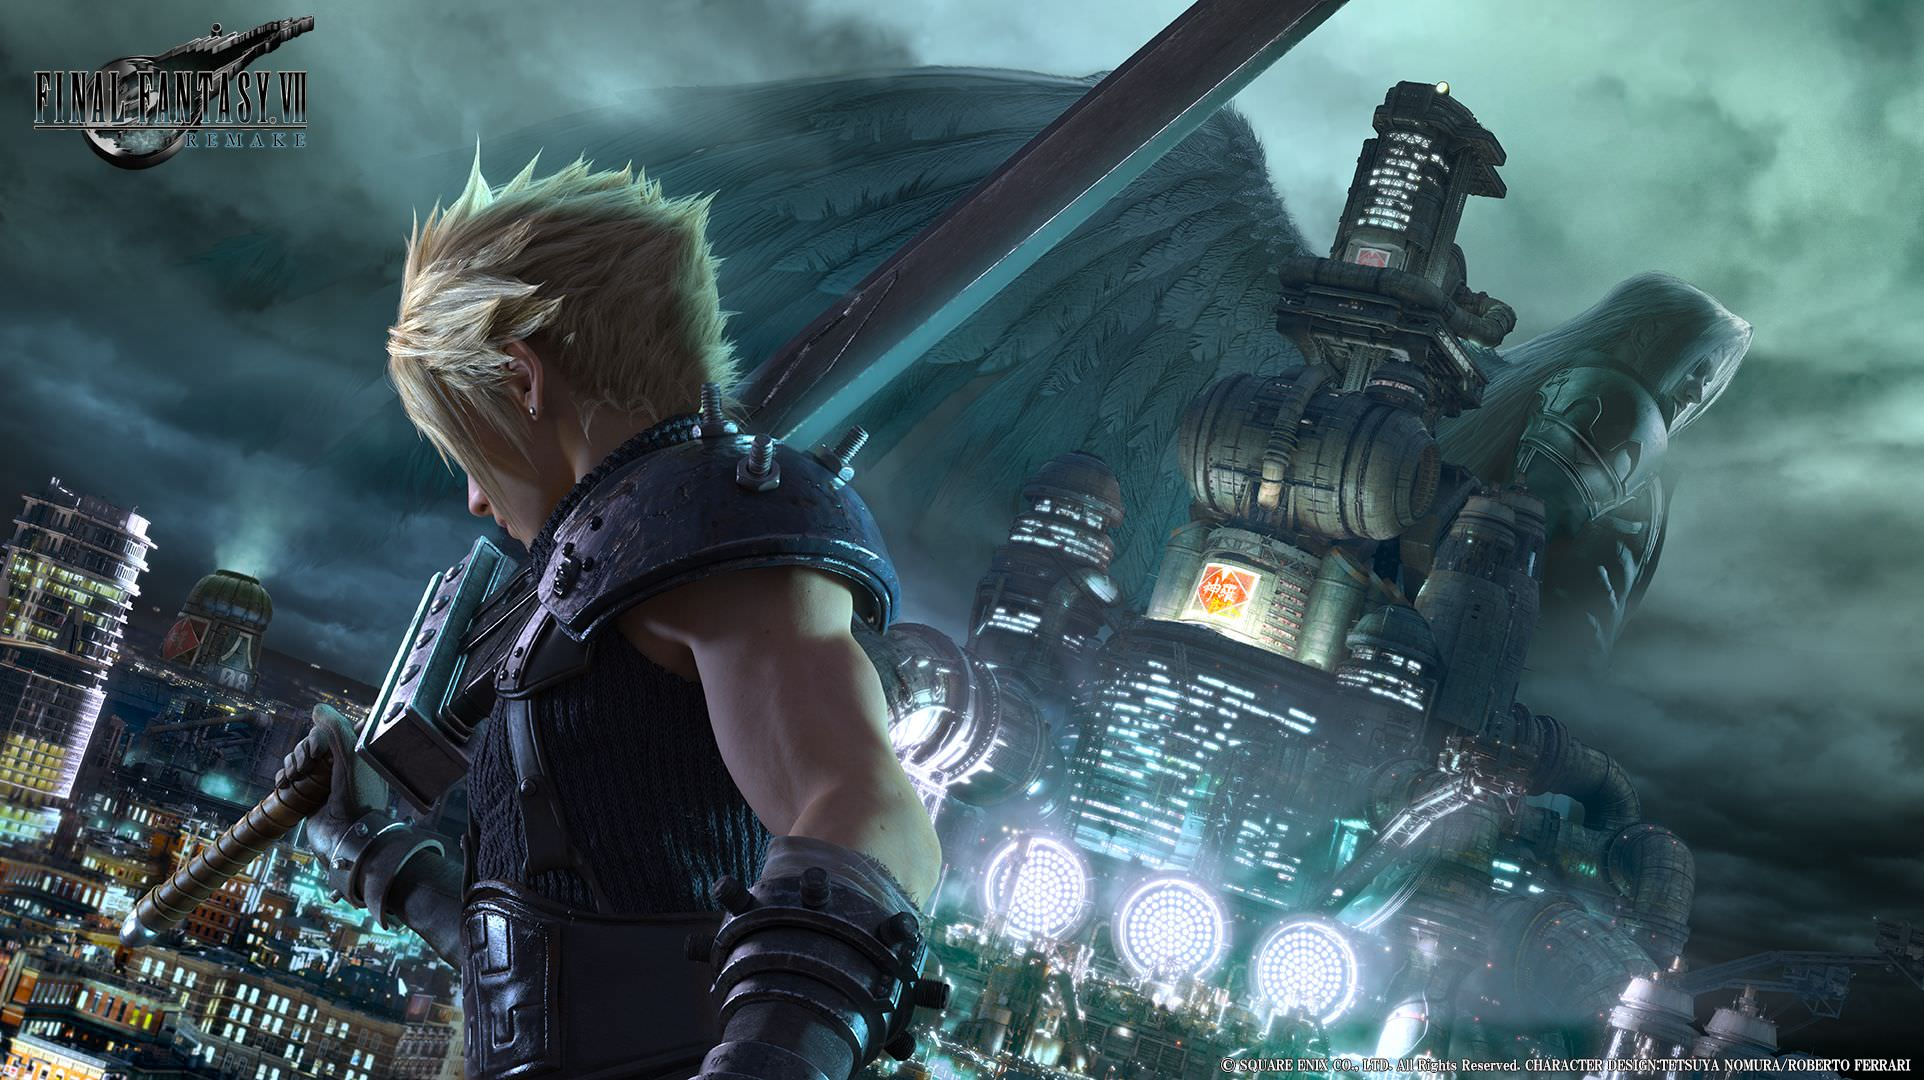 Final Fantasy VII Remake Key Art Unveiled